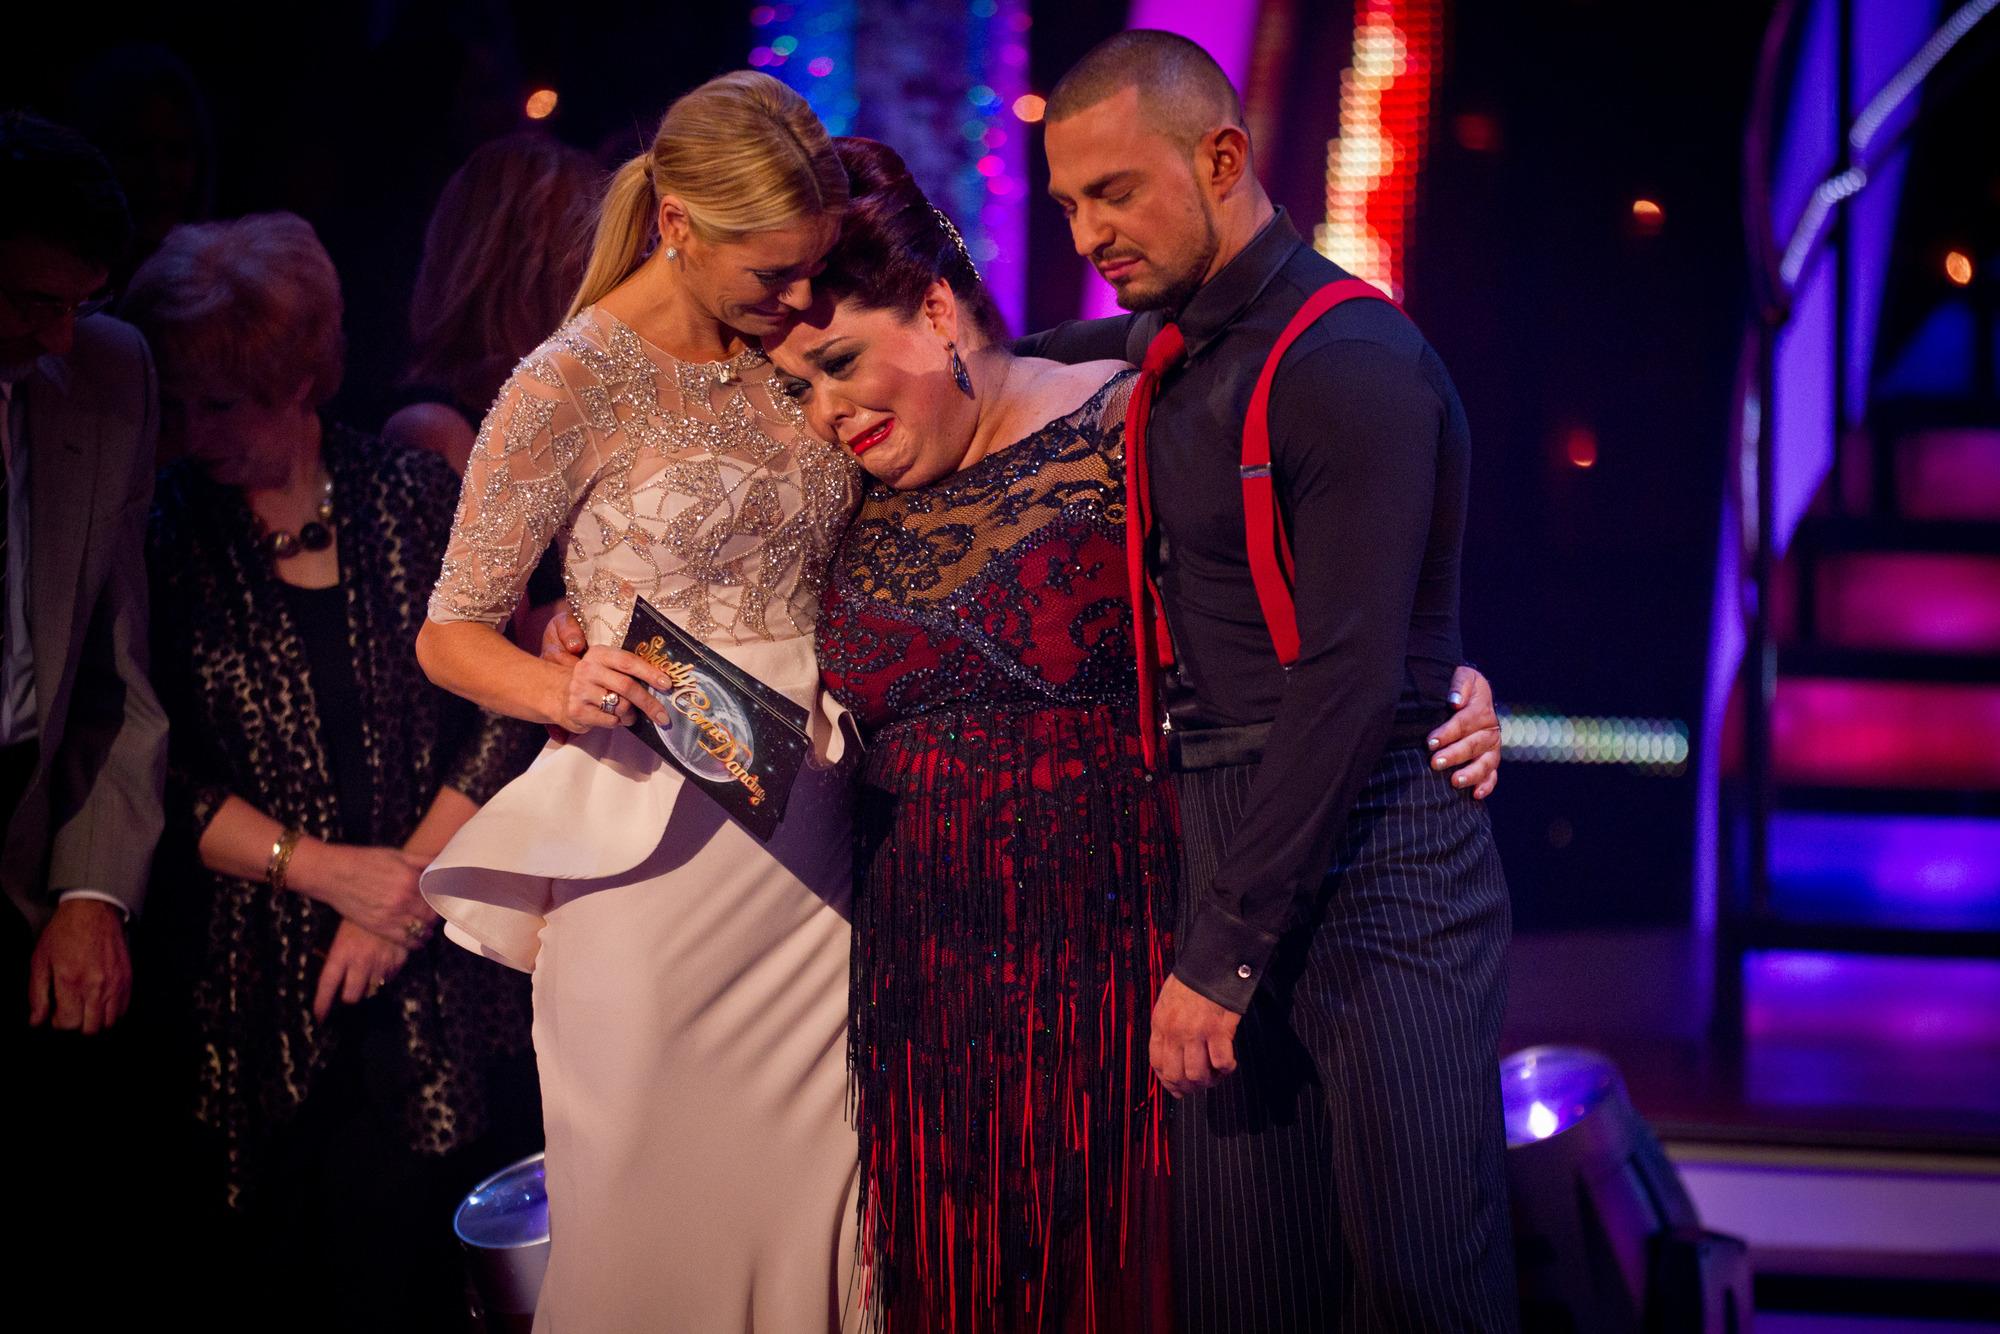 Tess Daly, Lisa Riley, Robin Windsor - (C) BBC - Photographer: Guy Levy